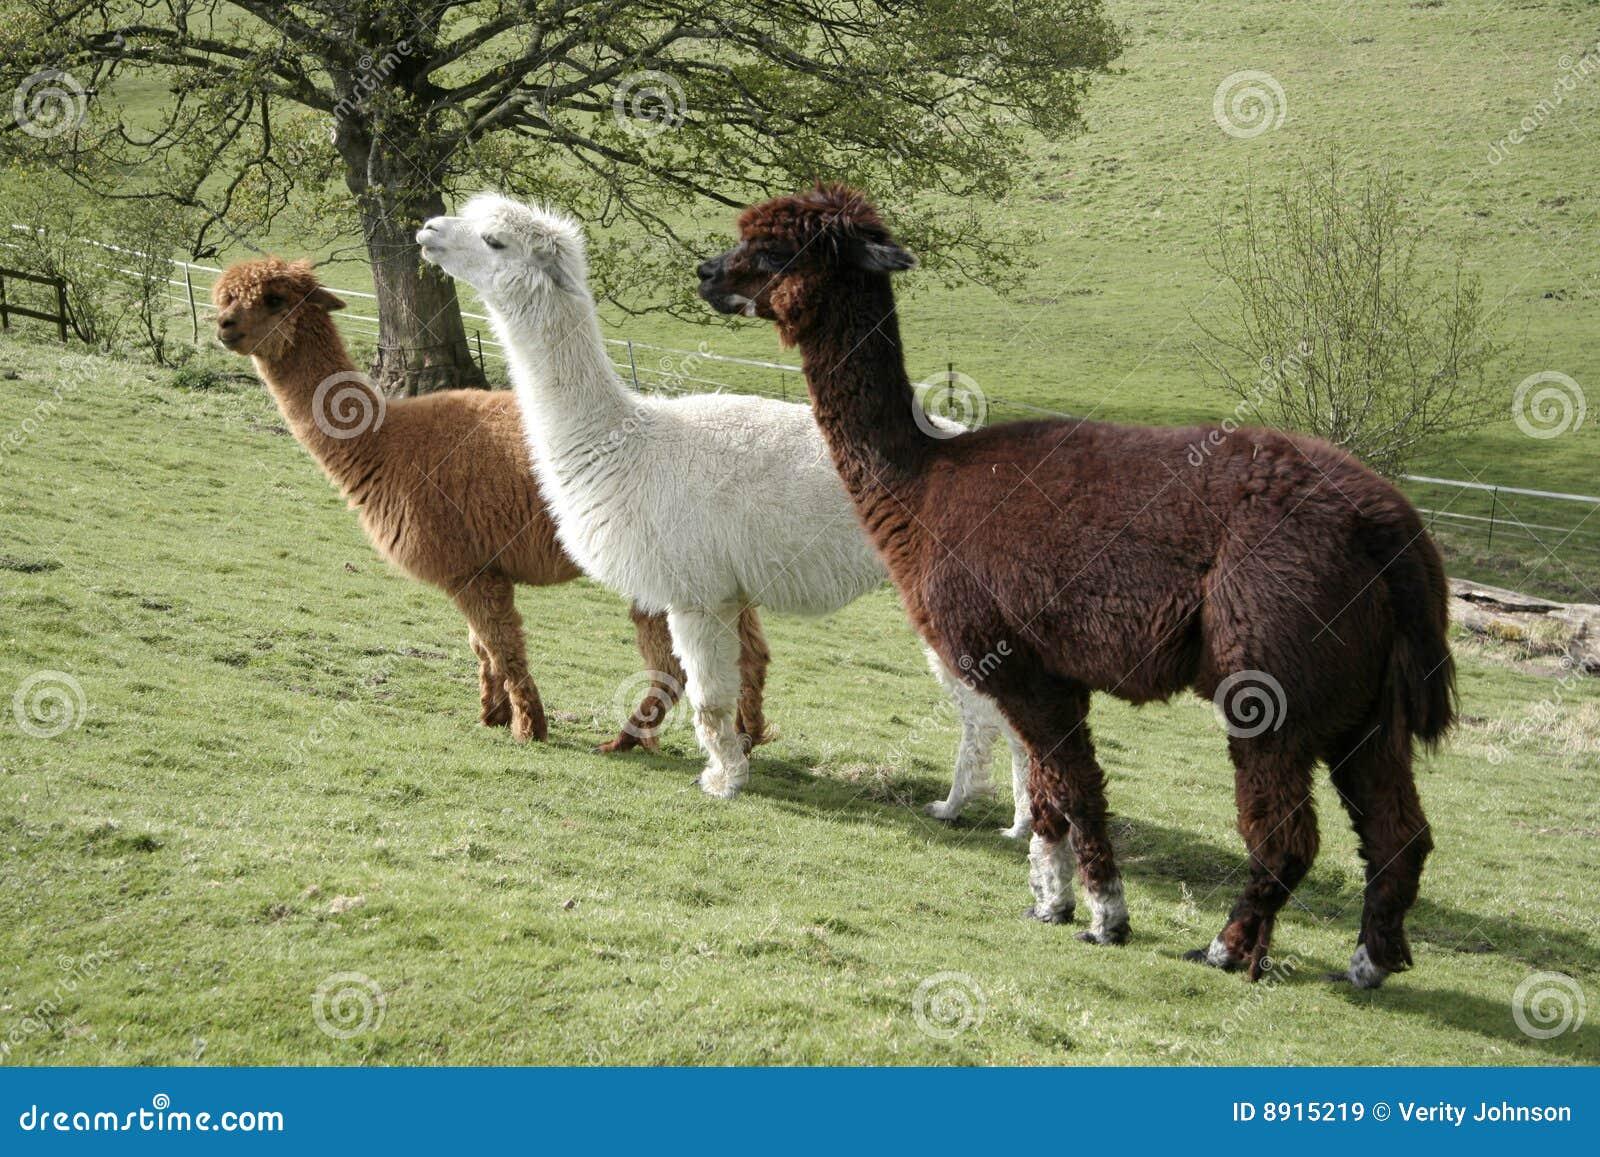 Three Funny Alpacas Royalty Free Stock Photography